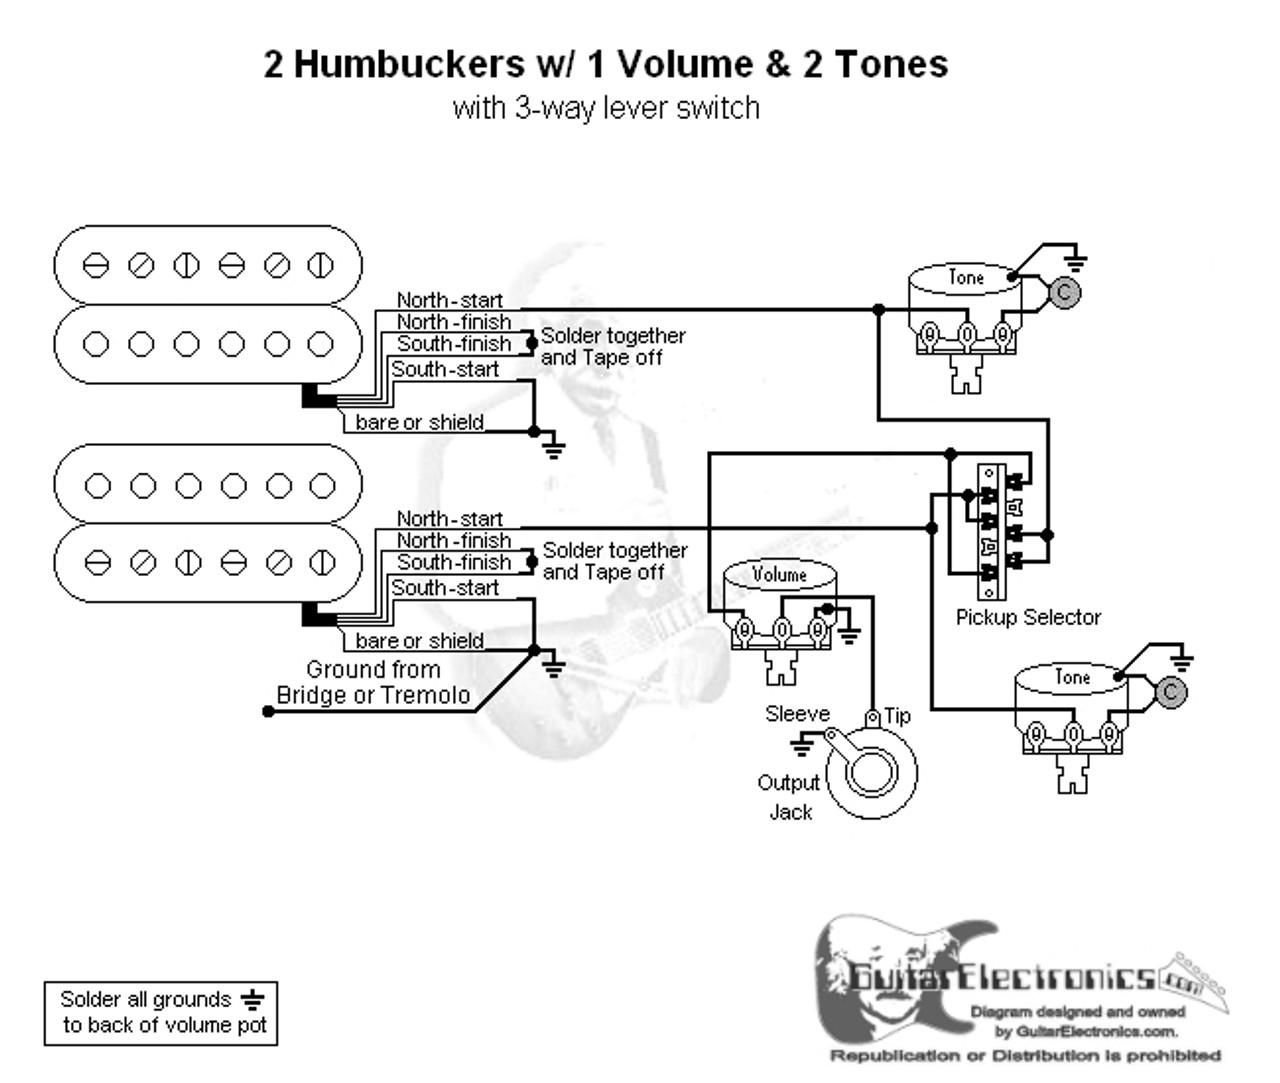 2 humbuckers 3 way lever switch 1 volume 2 tones Fender Electric Guitar Wiring Diagrams